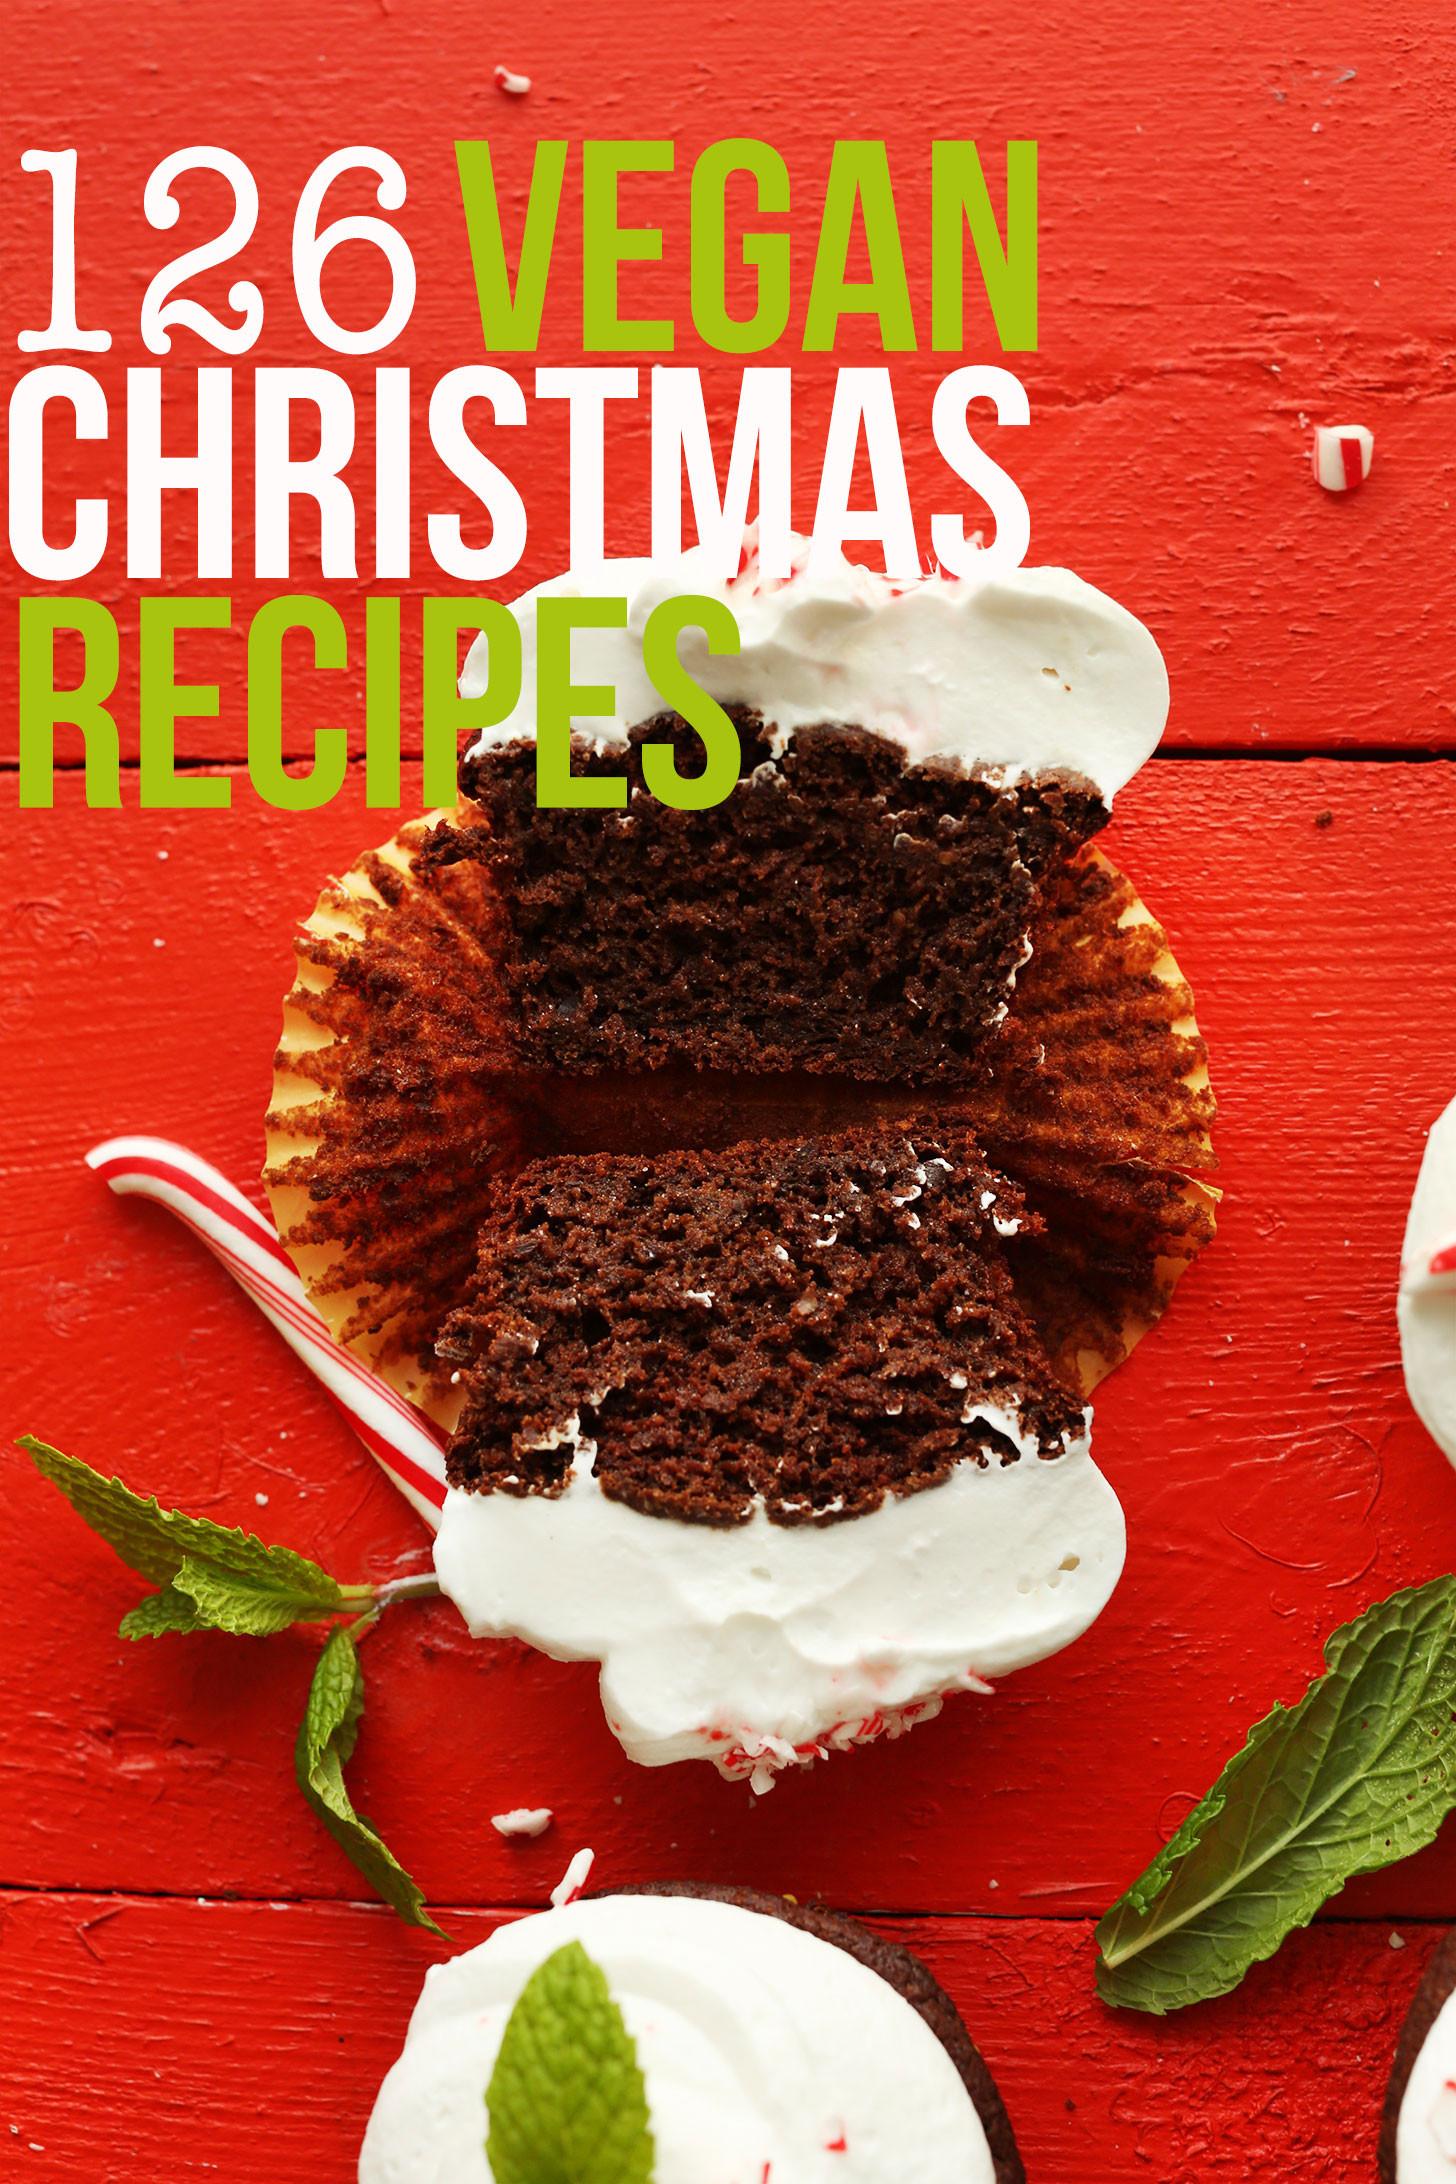 Vegan Holiday Recipes  126 Vegan Christmas Recipes